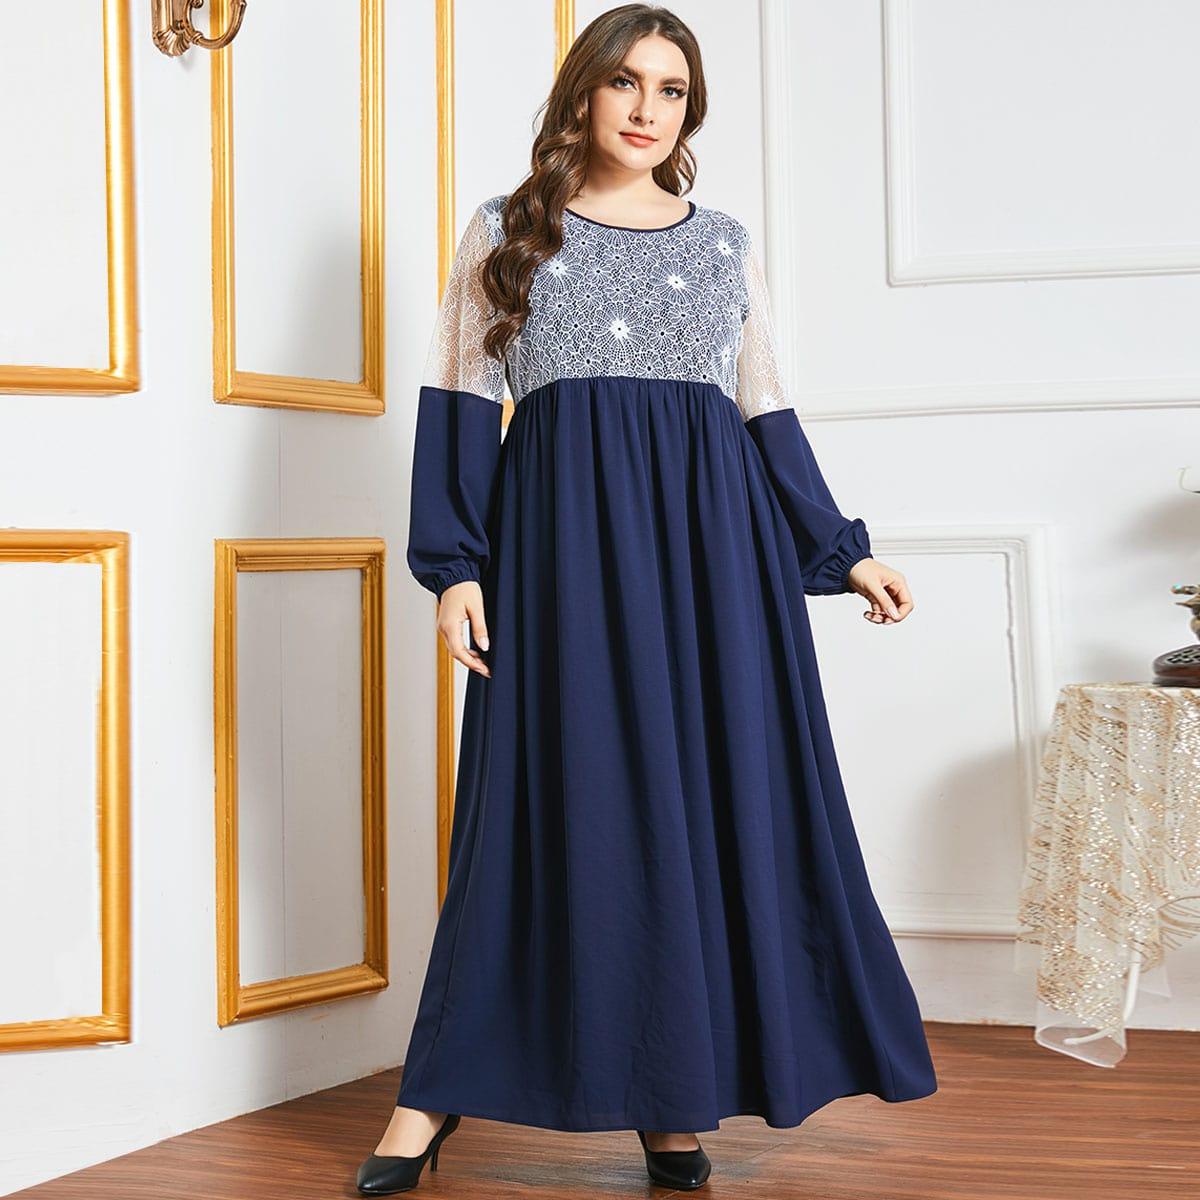 Контрастные кружева Контрастный цвет Элегантный Платья размер плюс